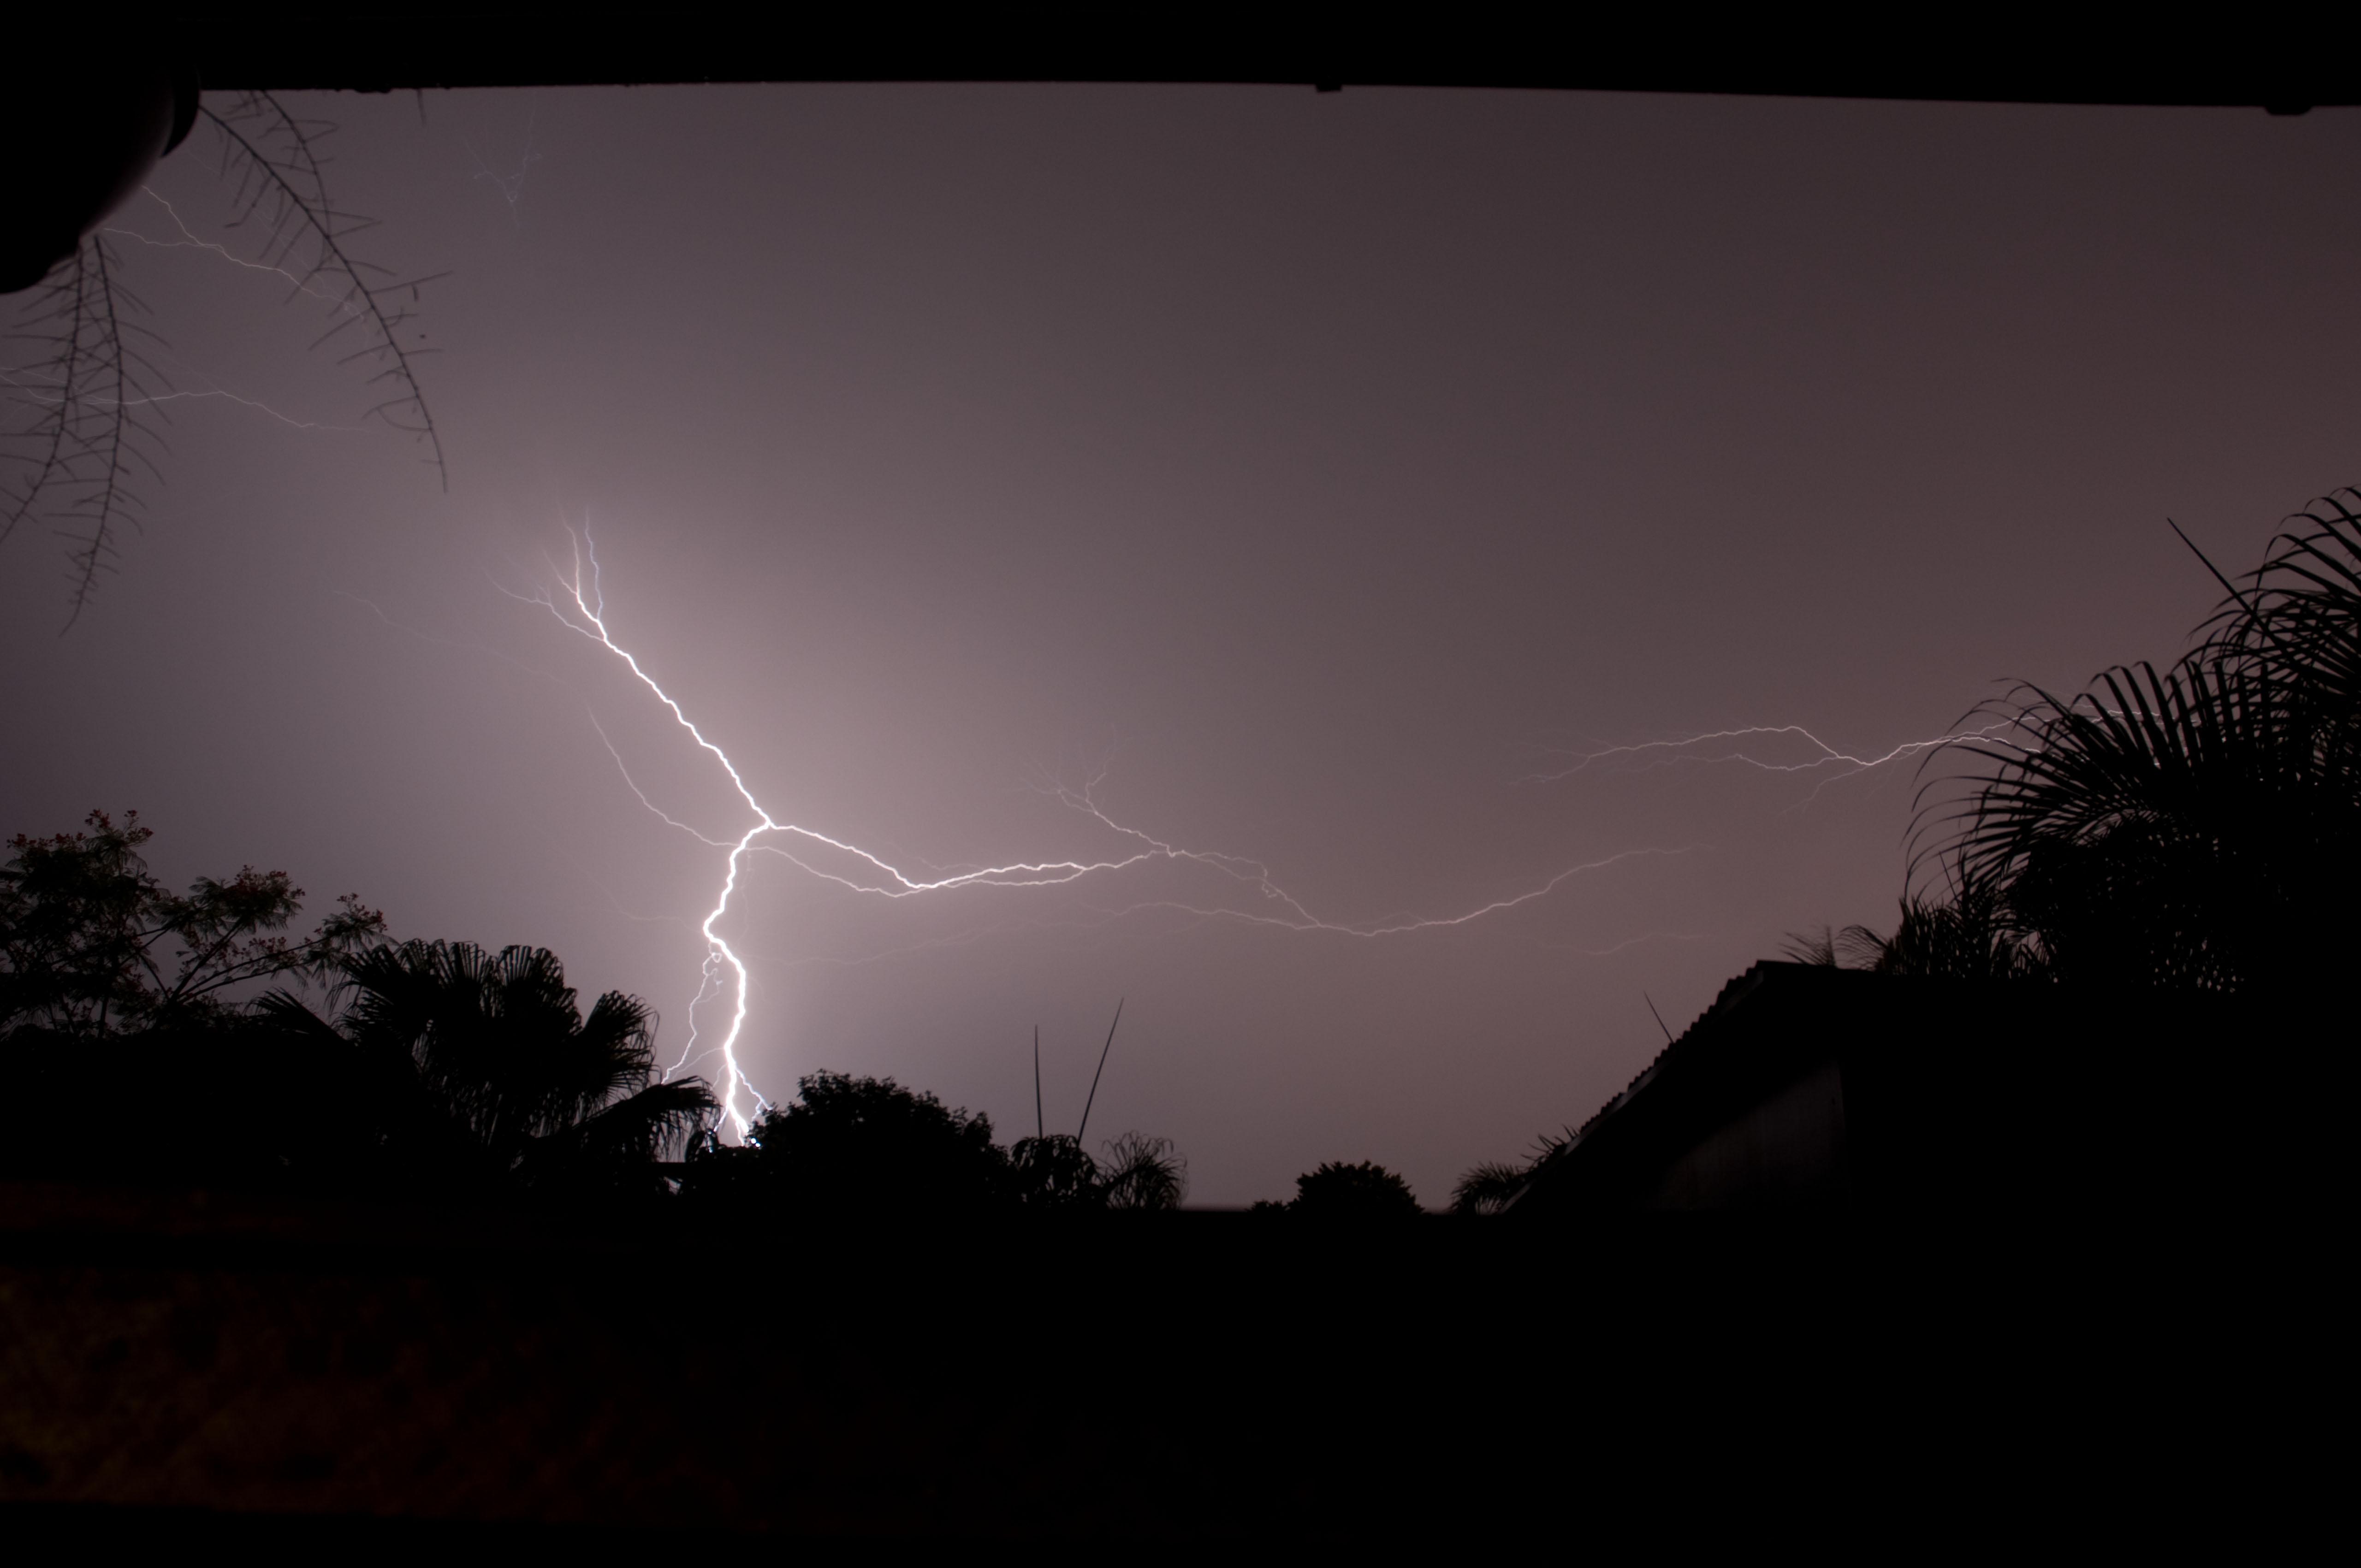 Lightning, Energy, Storm, HQ Photo